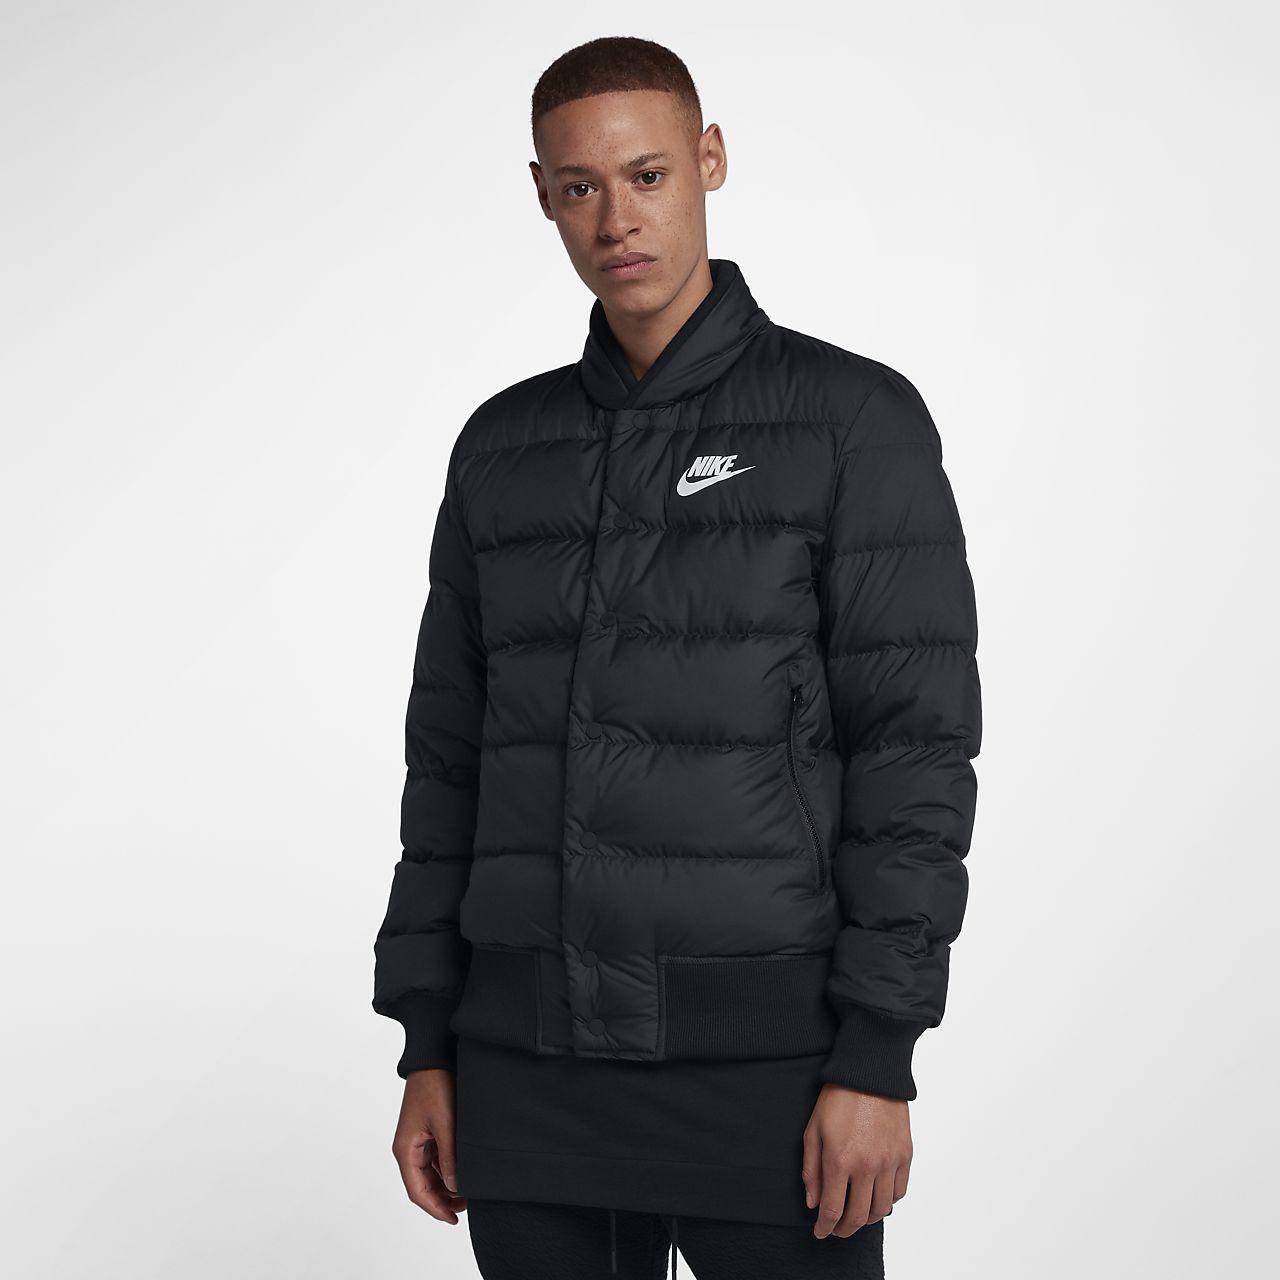 f4fa9338b88e Nike Sportswear Down Fill Men s Bomber Jacket. Nike.com GB